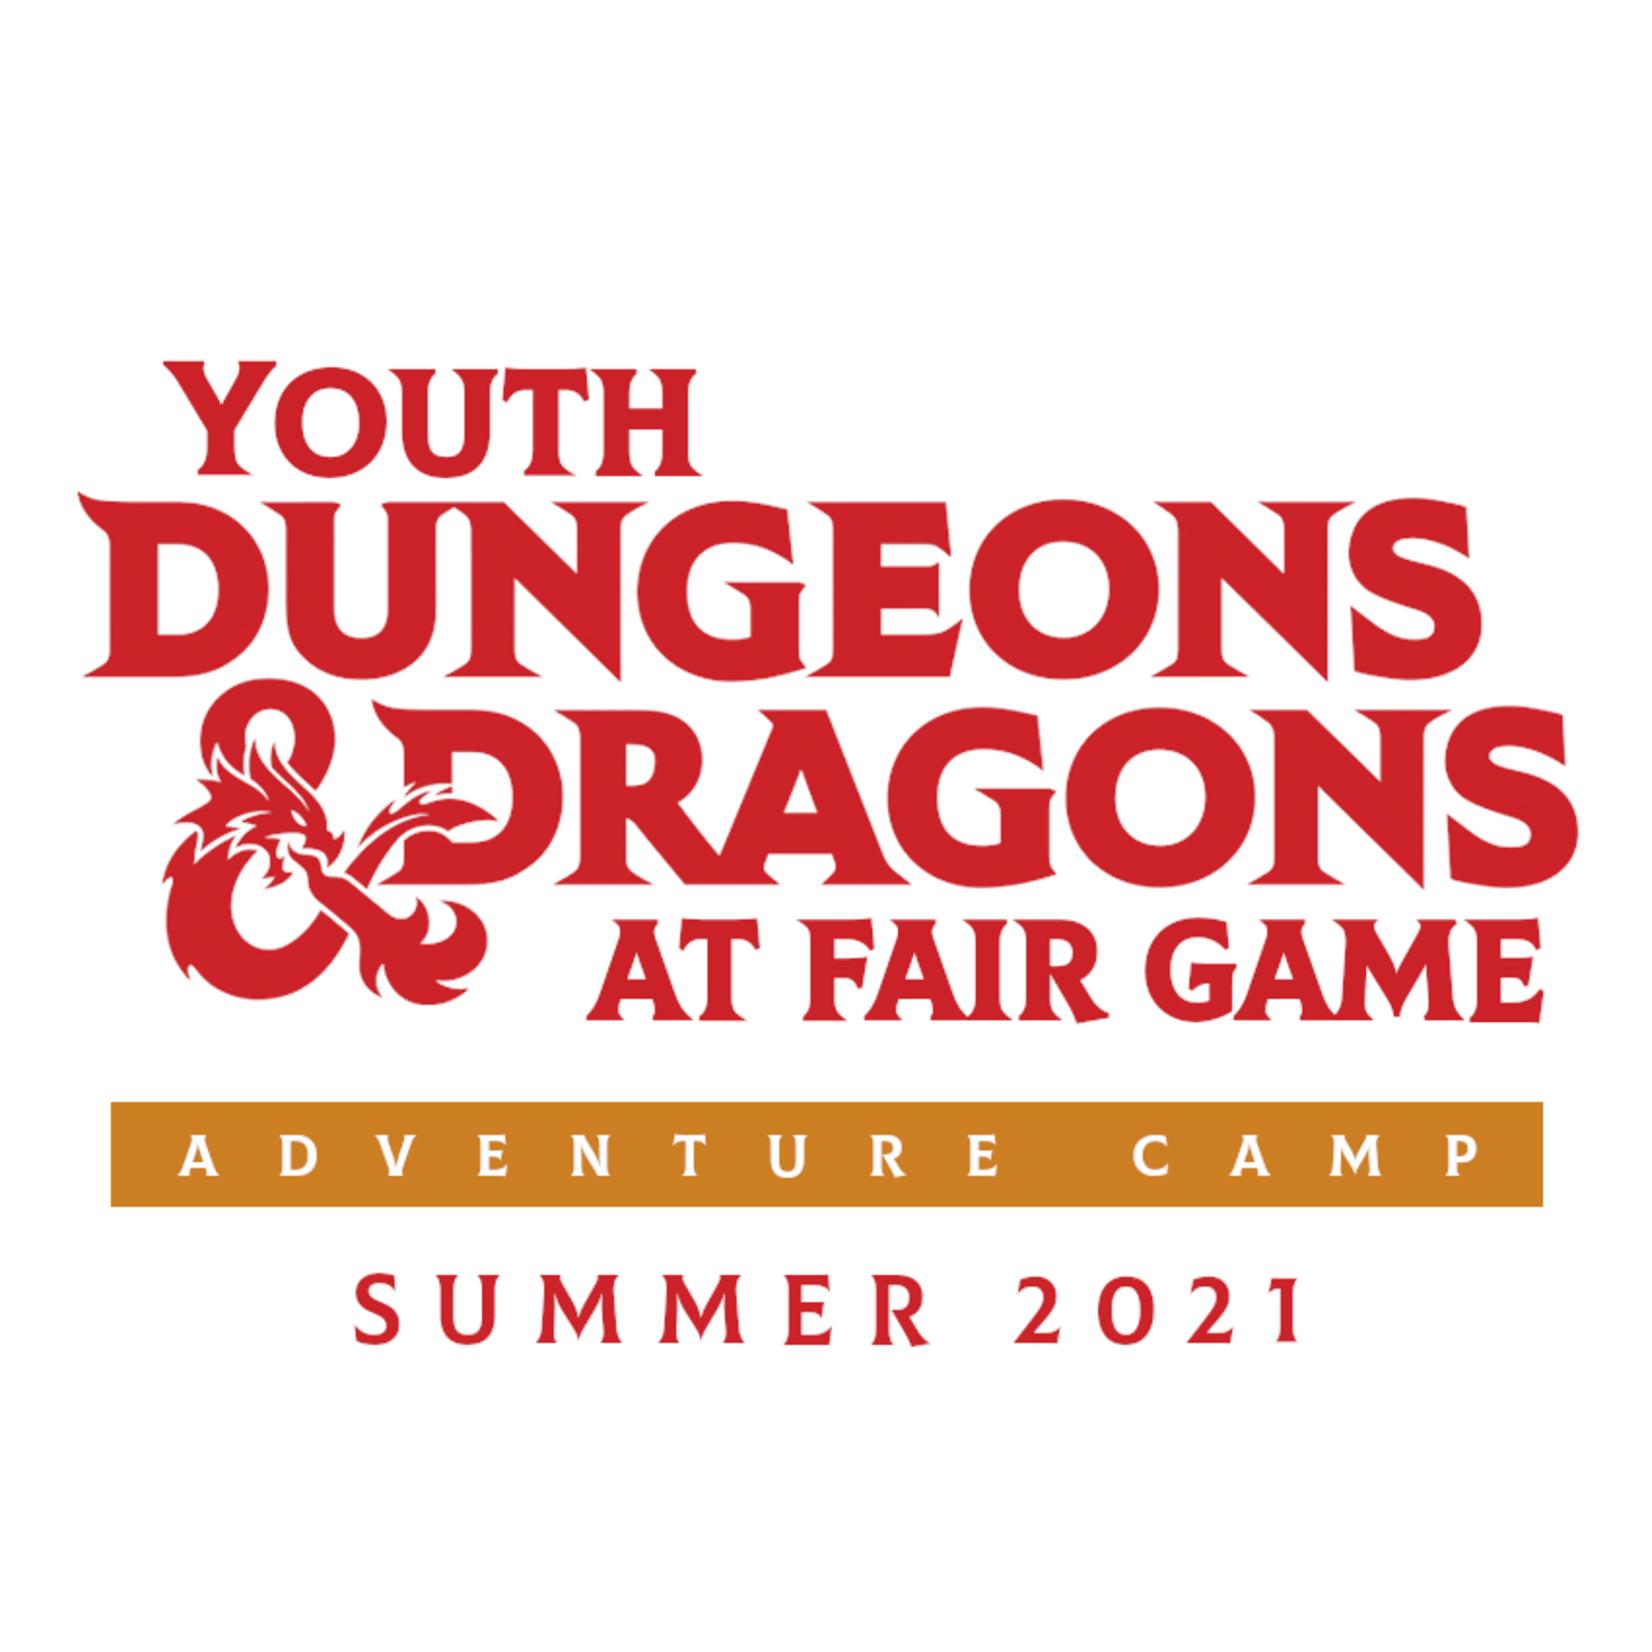 Fair Game YDND June 2021 - Adventure Camp -June 7, 9, 11 - 1-3 PM CST (Ages 8-13)